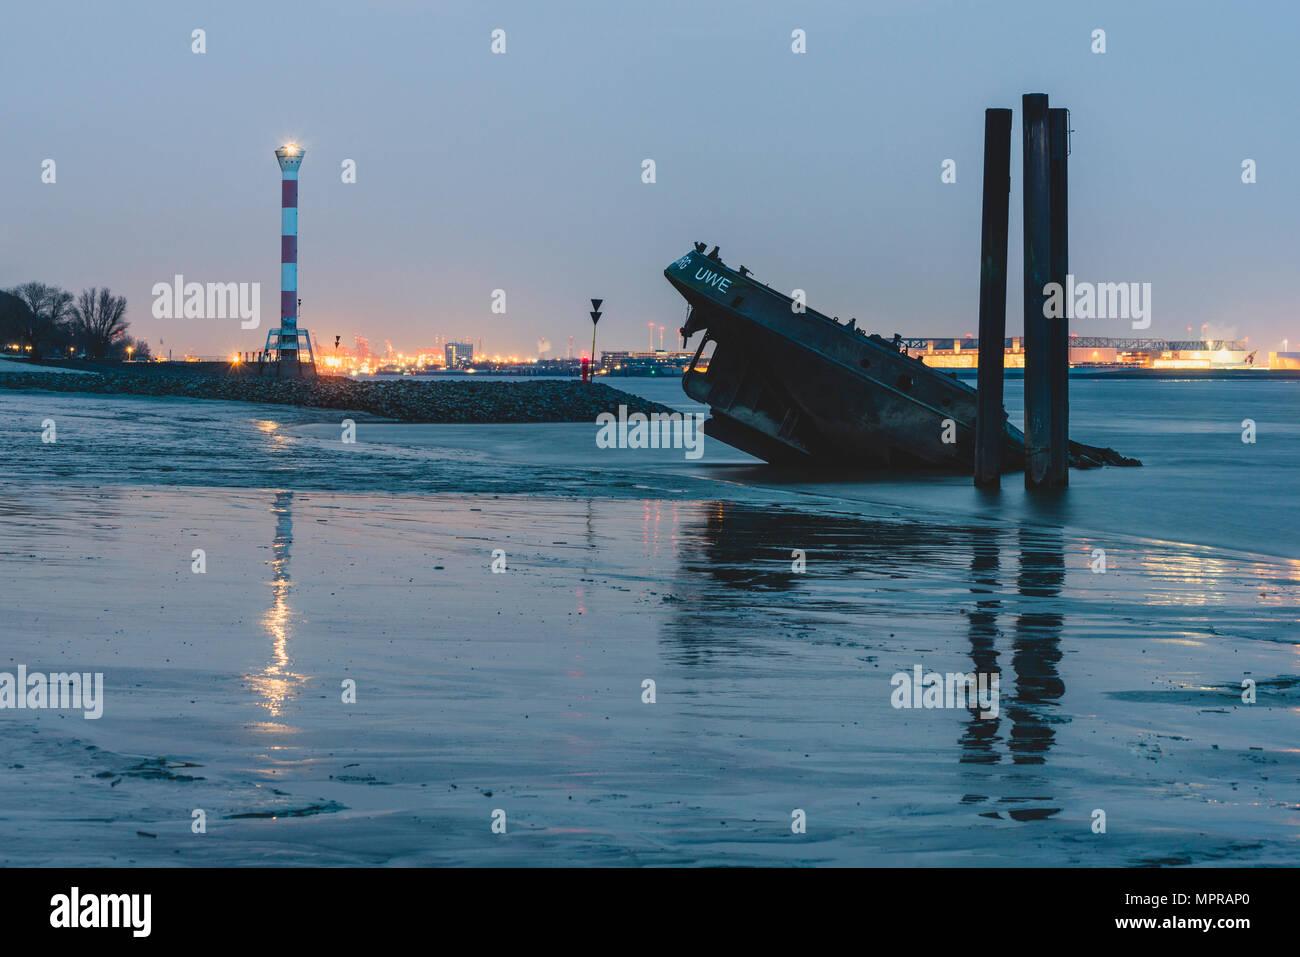 Germany, Hamburg, Blankenese, Light house and wreck Uwe in the evening - Stock Image